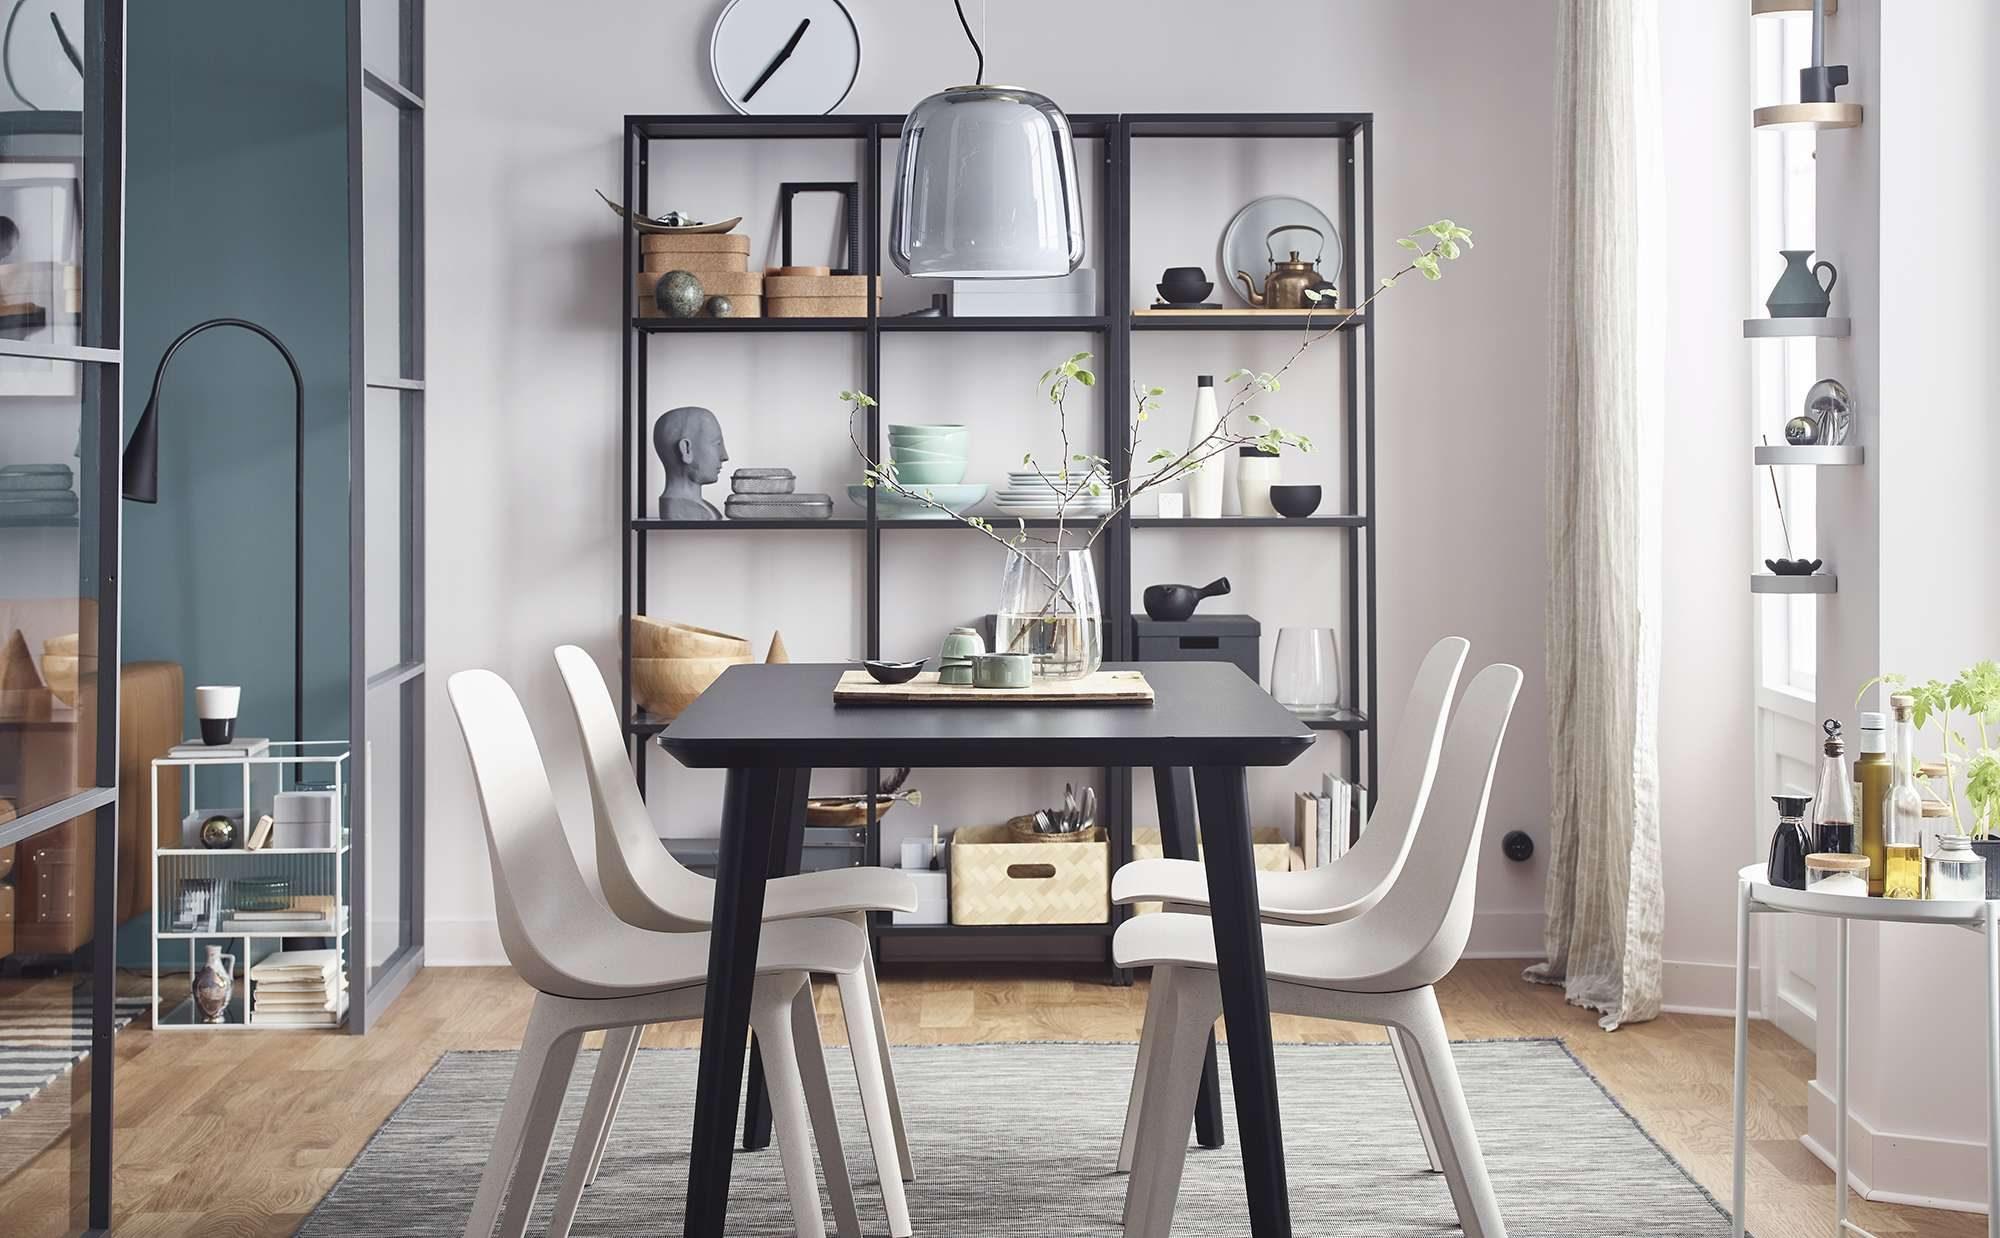 IKEA(イケア)のアイテムで、シンプルな北欧インテリアを楽しむ